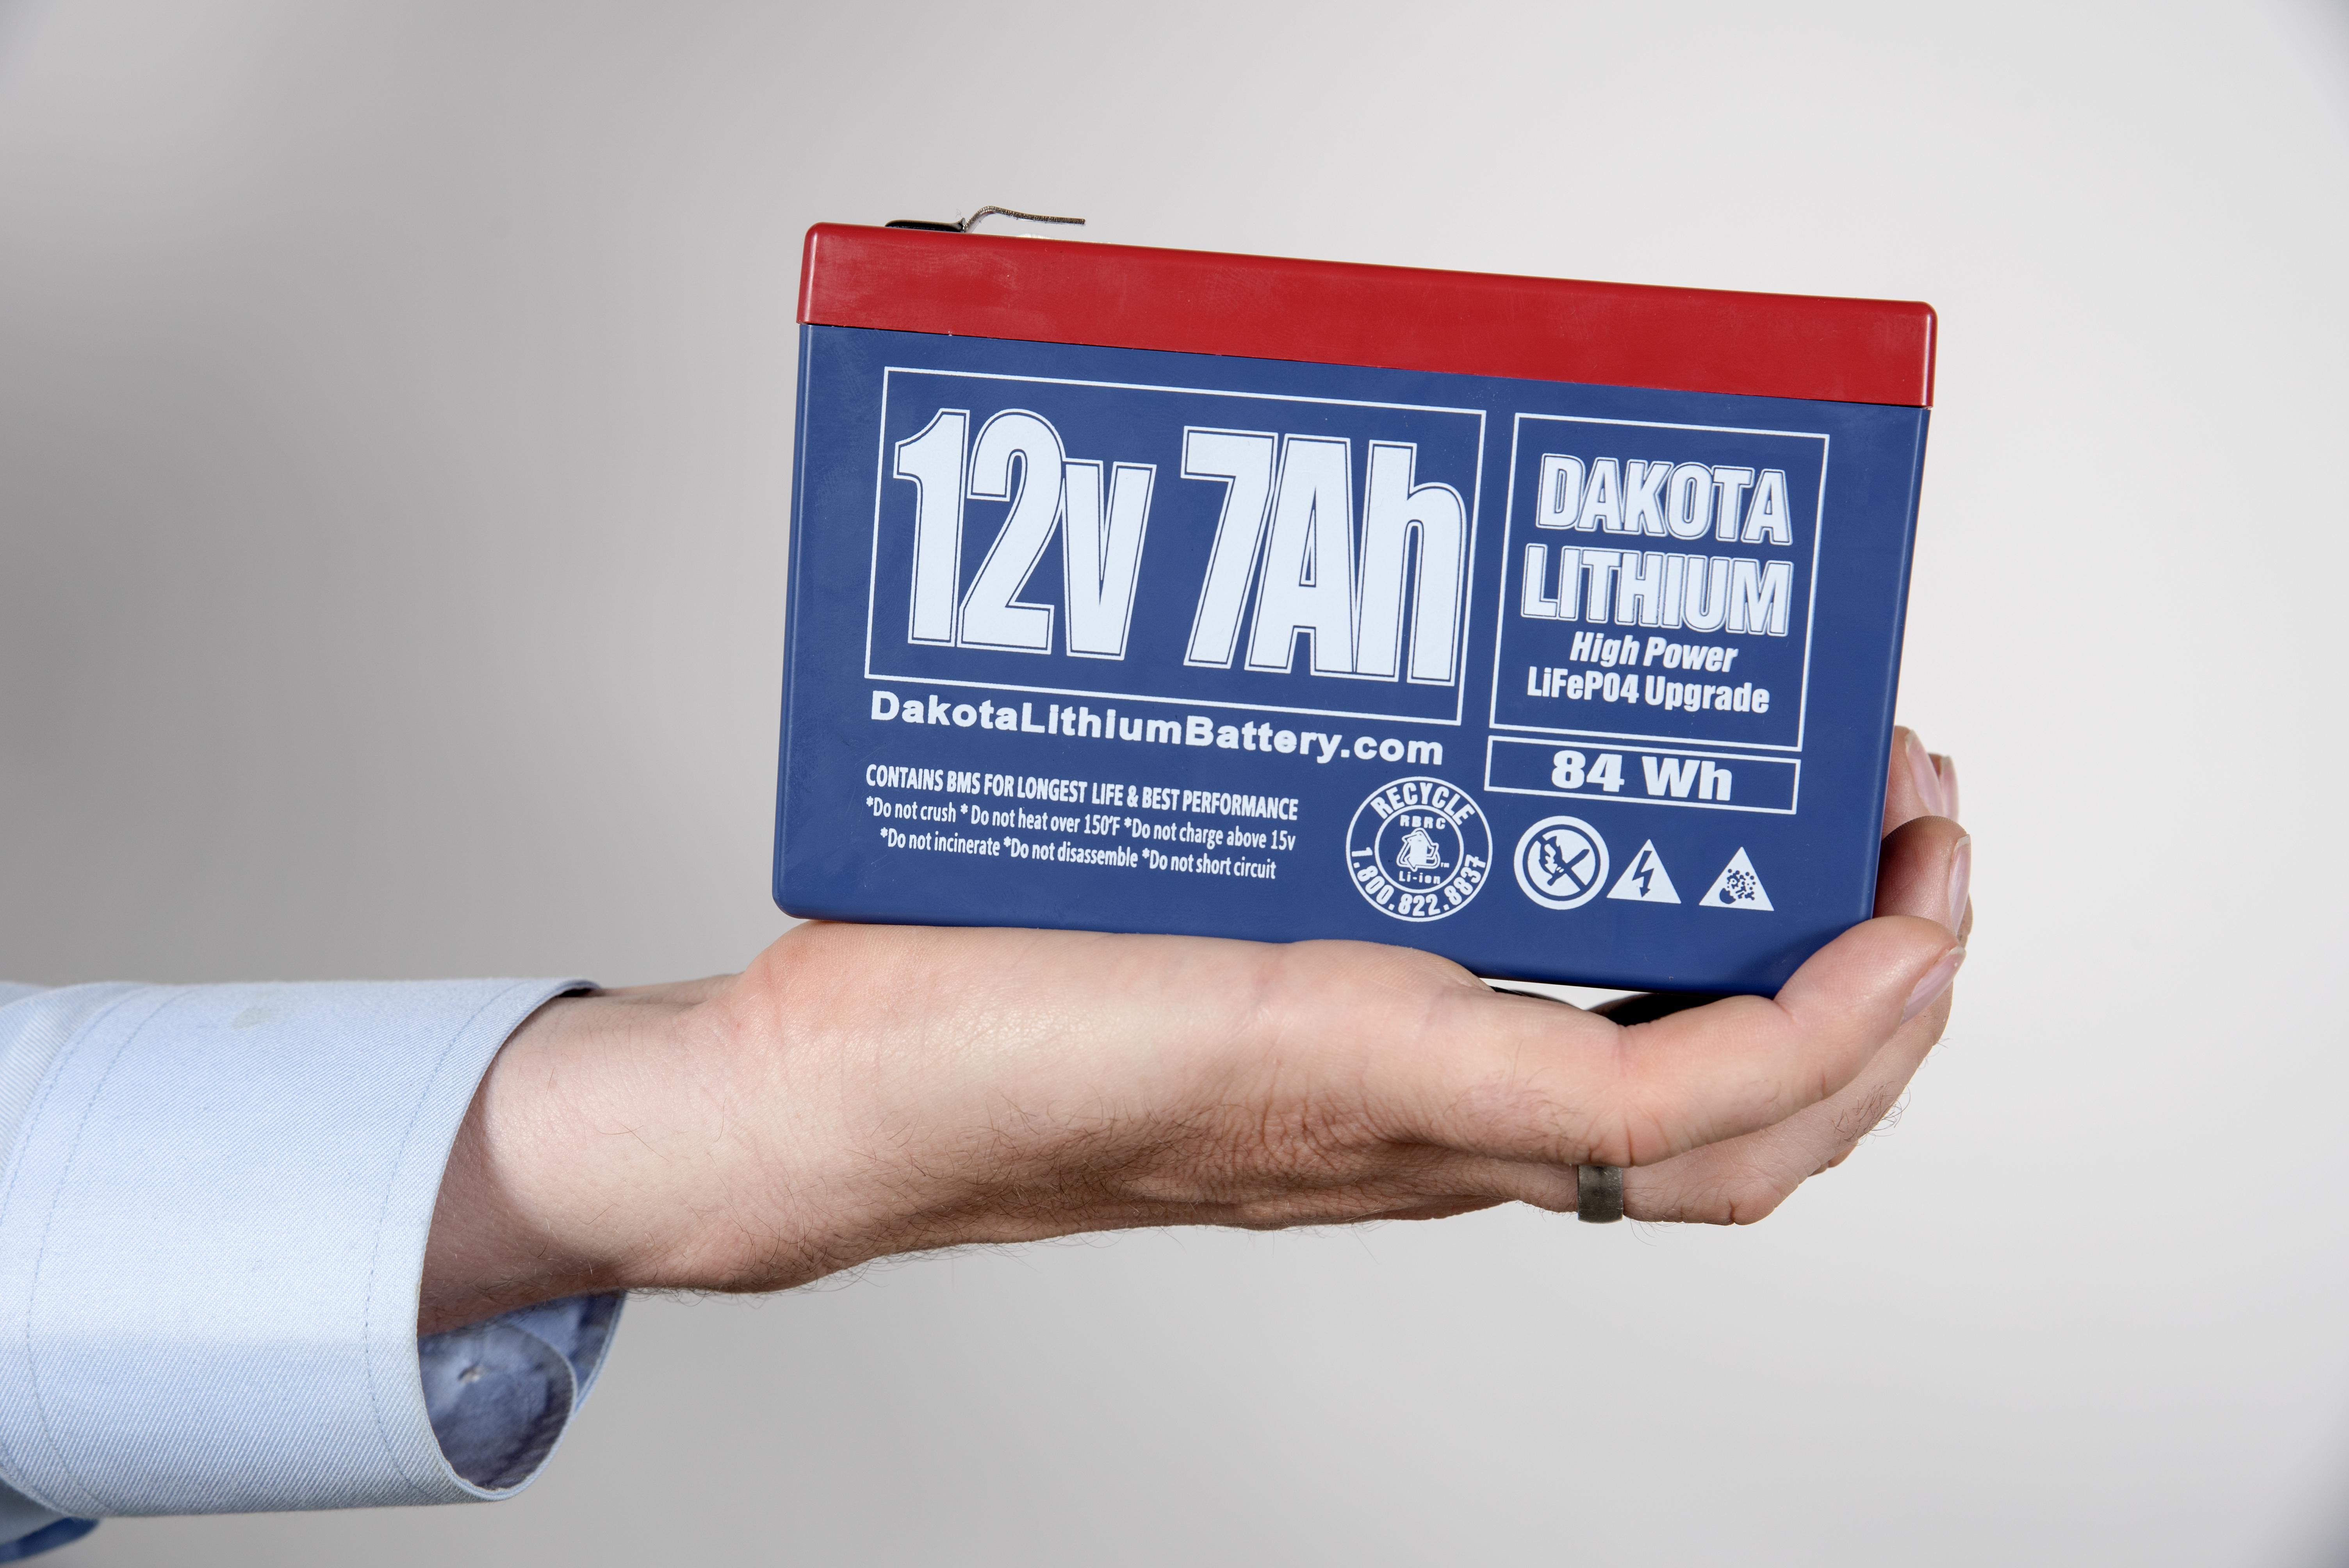 12 V Dakota Lithium Battery 7 Ah Lifepo4 Short Circuit